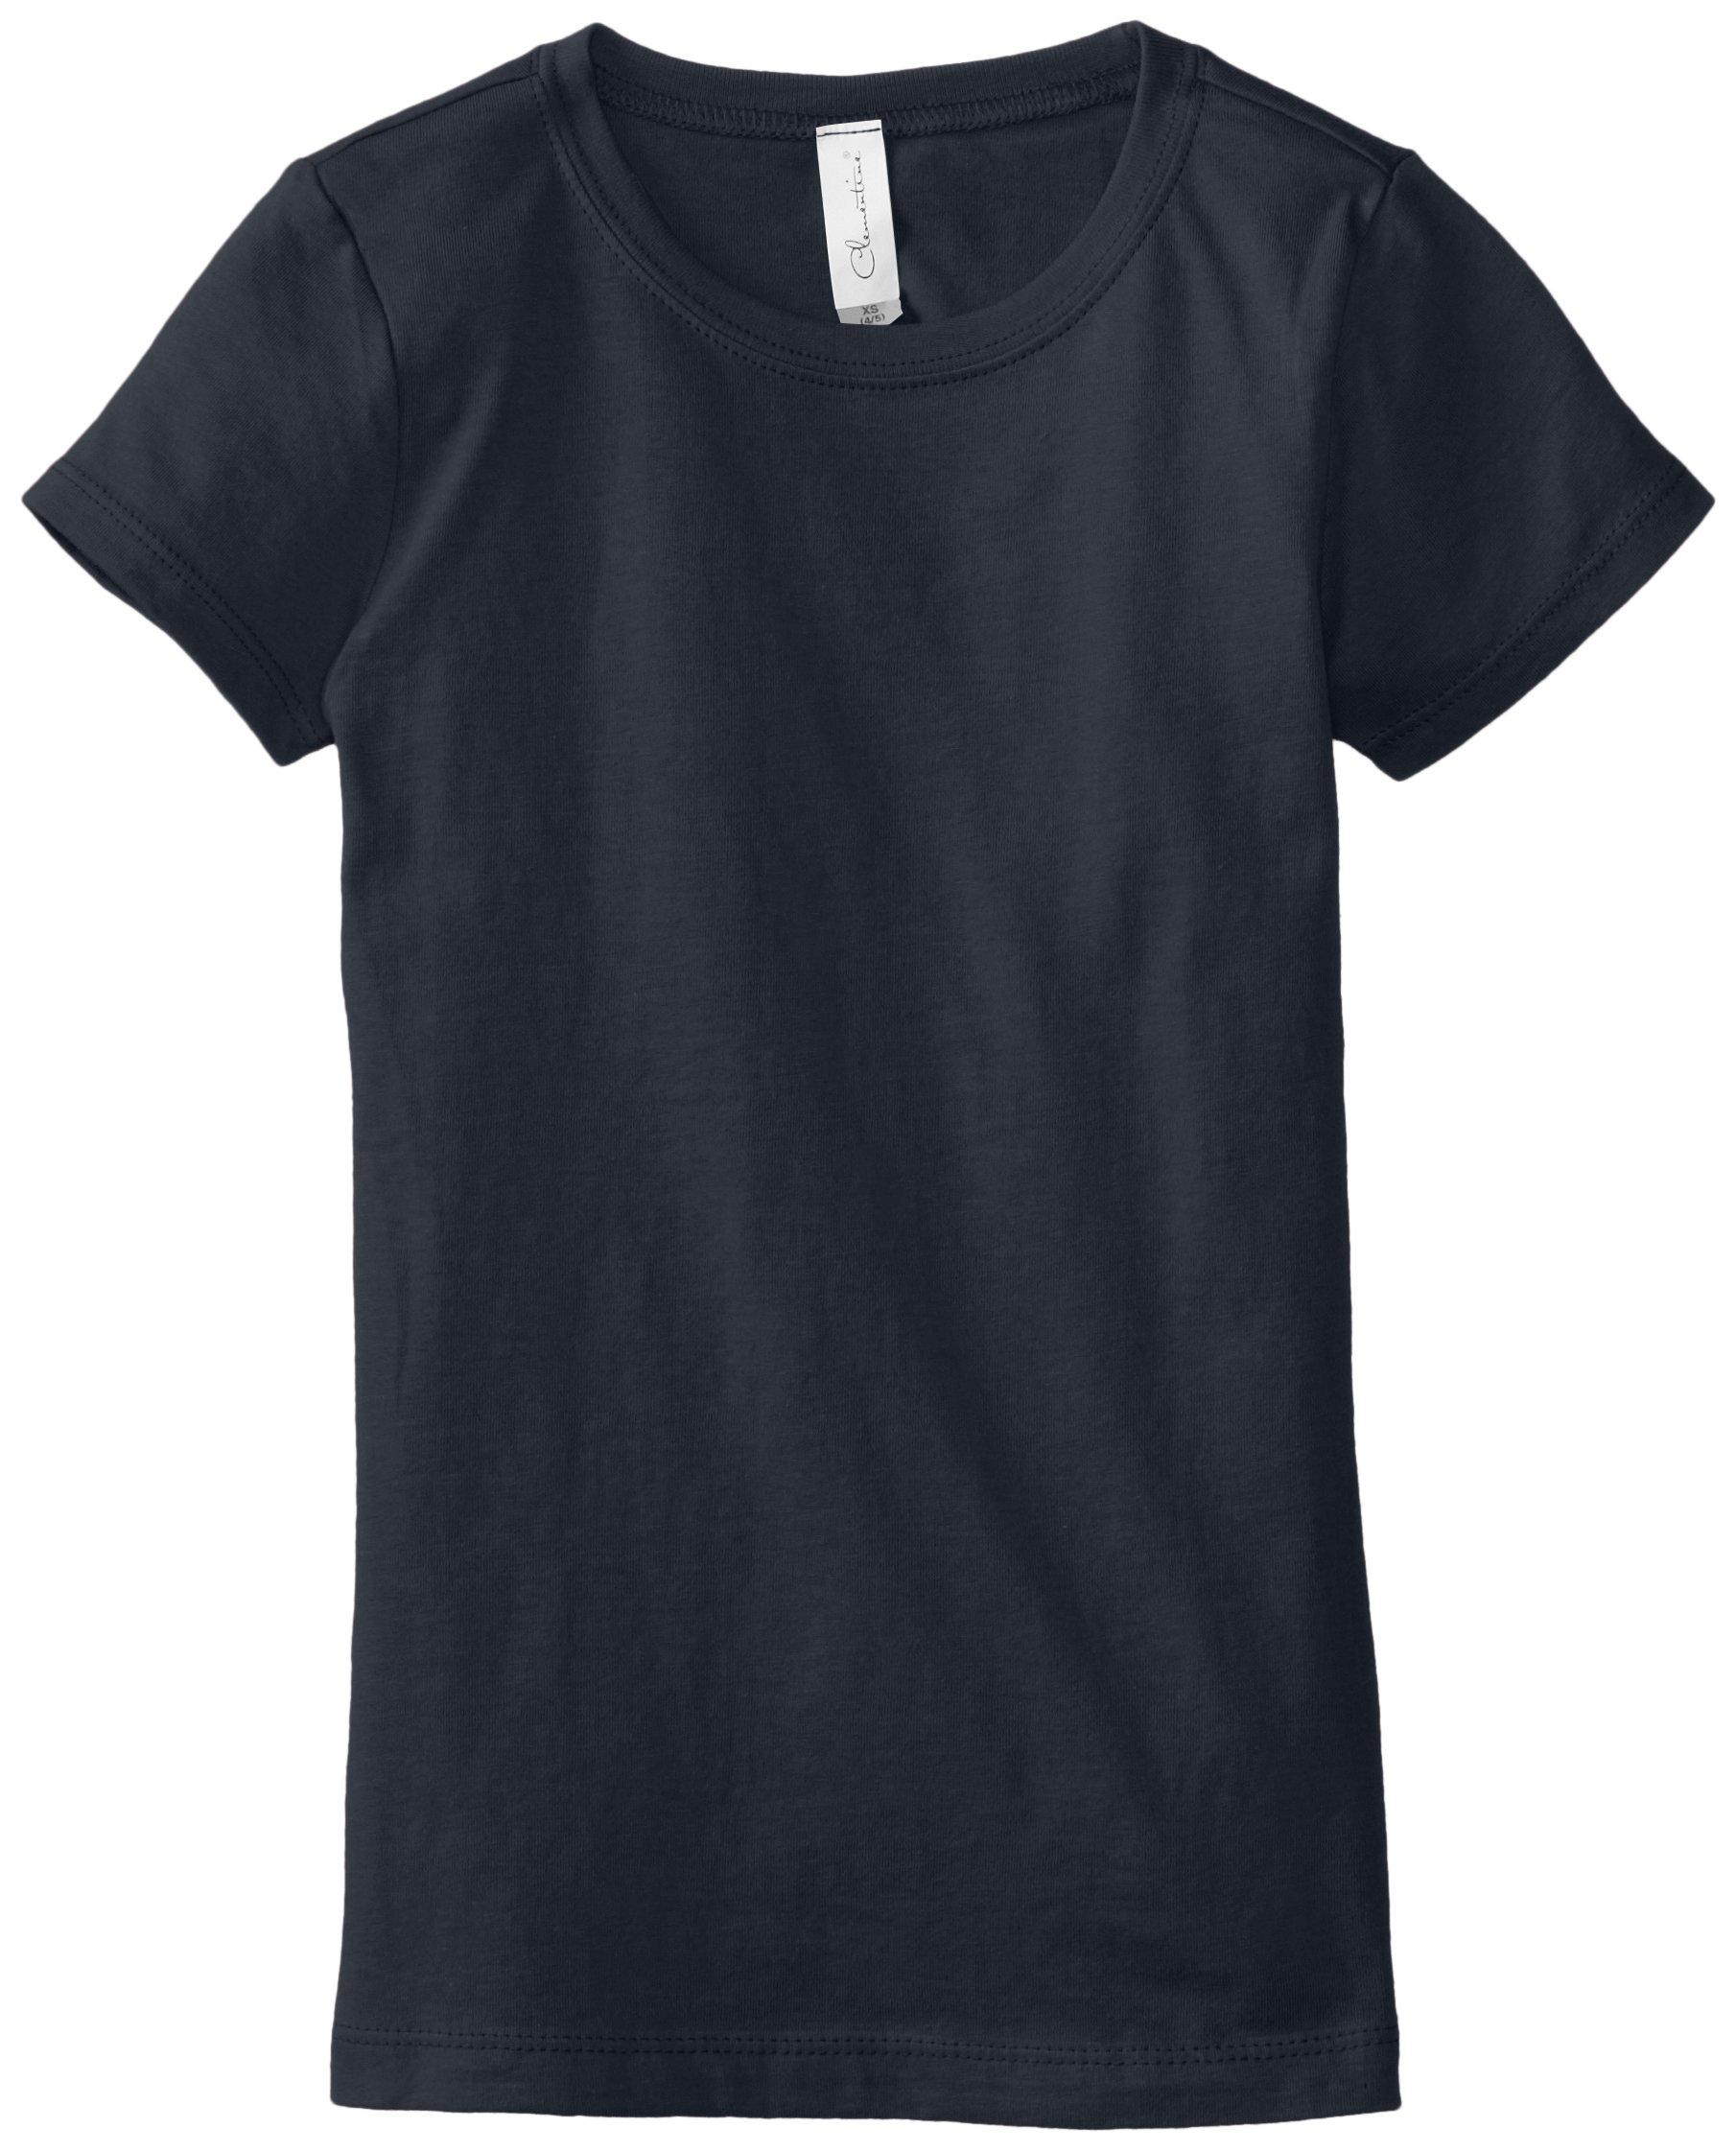 Clementine Big Girls' Everyday T-Shirt, Midnight Navy, Large(10-12)